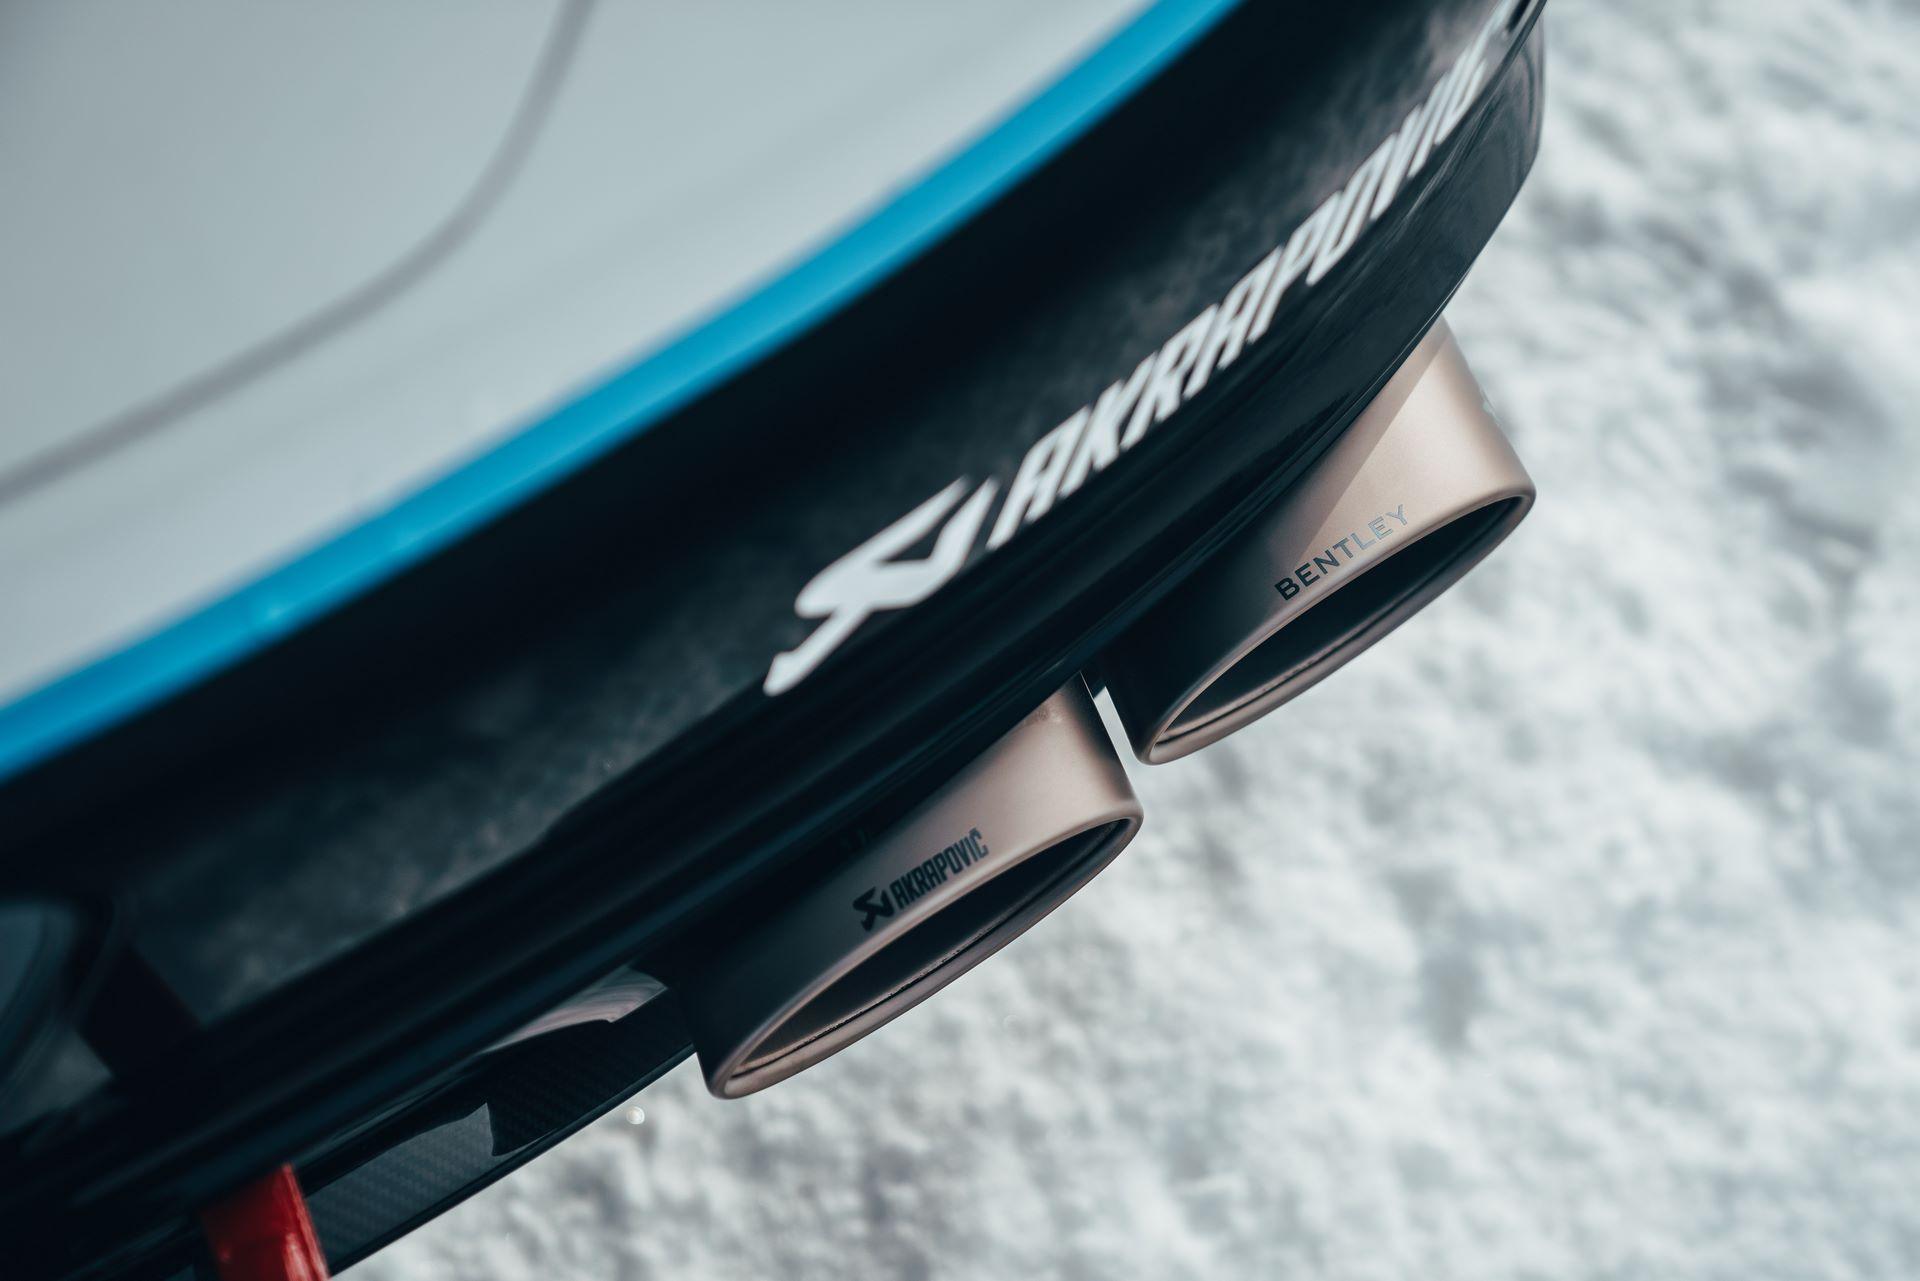 Bentley-Continental-GT-Ice-Race-2020-7